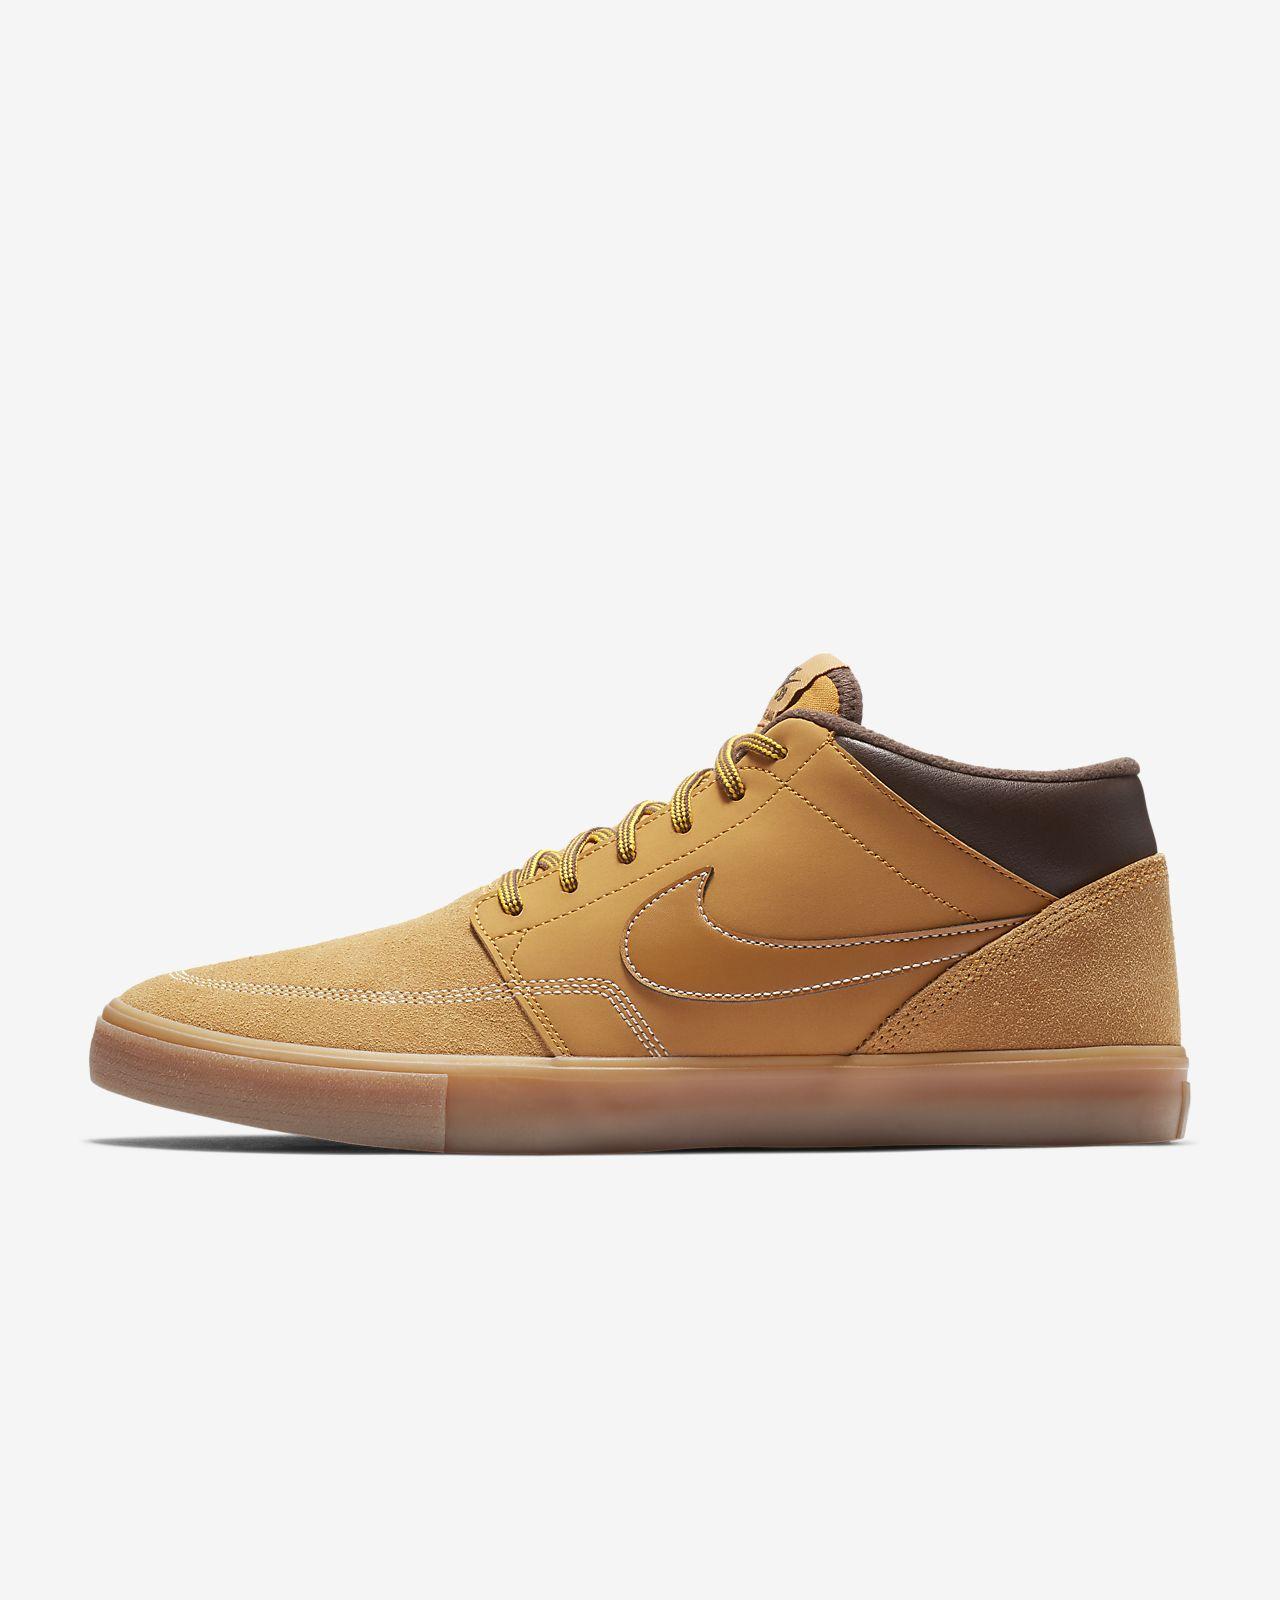 best service b80bd 73154 ... Chaussure de skateboard Nike SB Portmore II Solarsoft Mid Bota pour  Homme